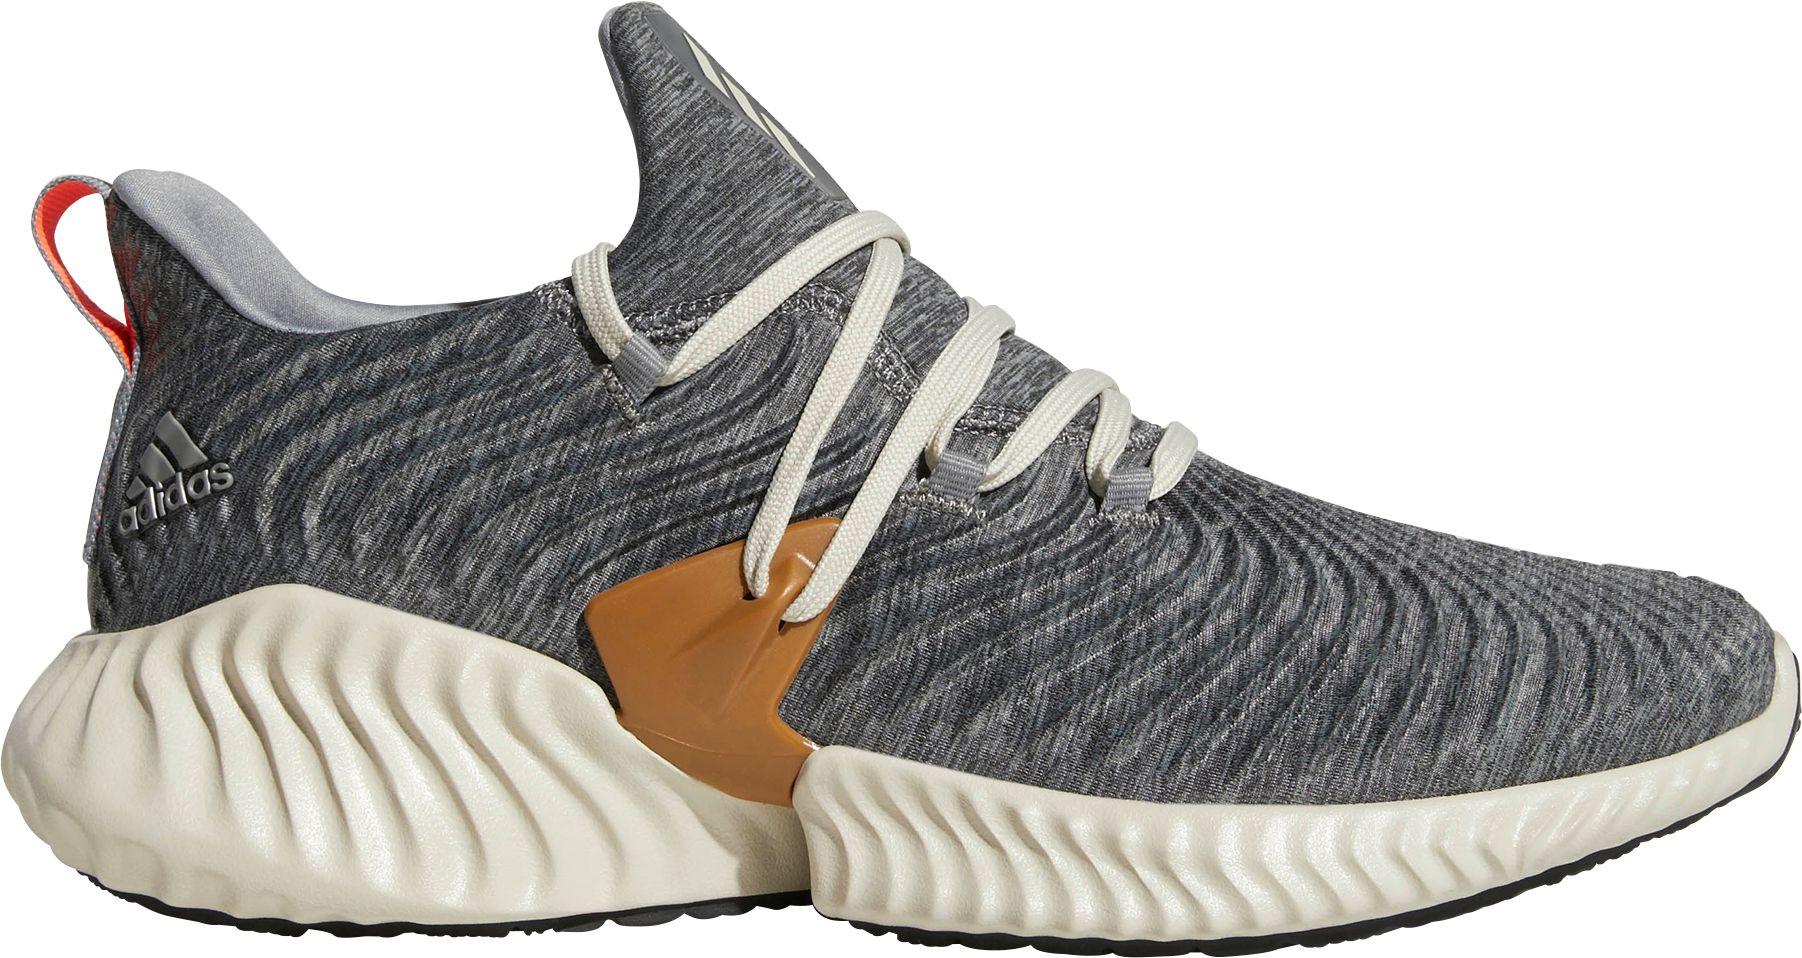 alphabounce Instinct Running Shoes